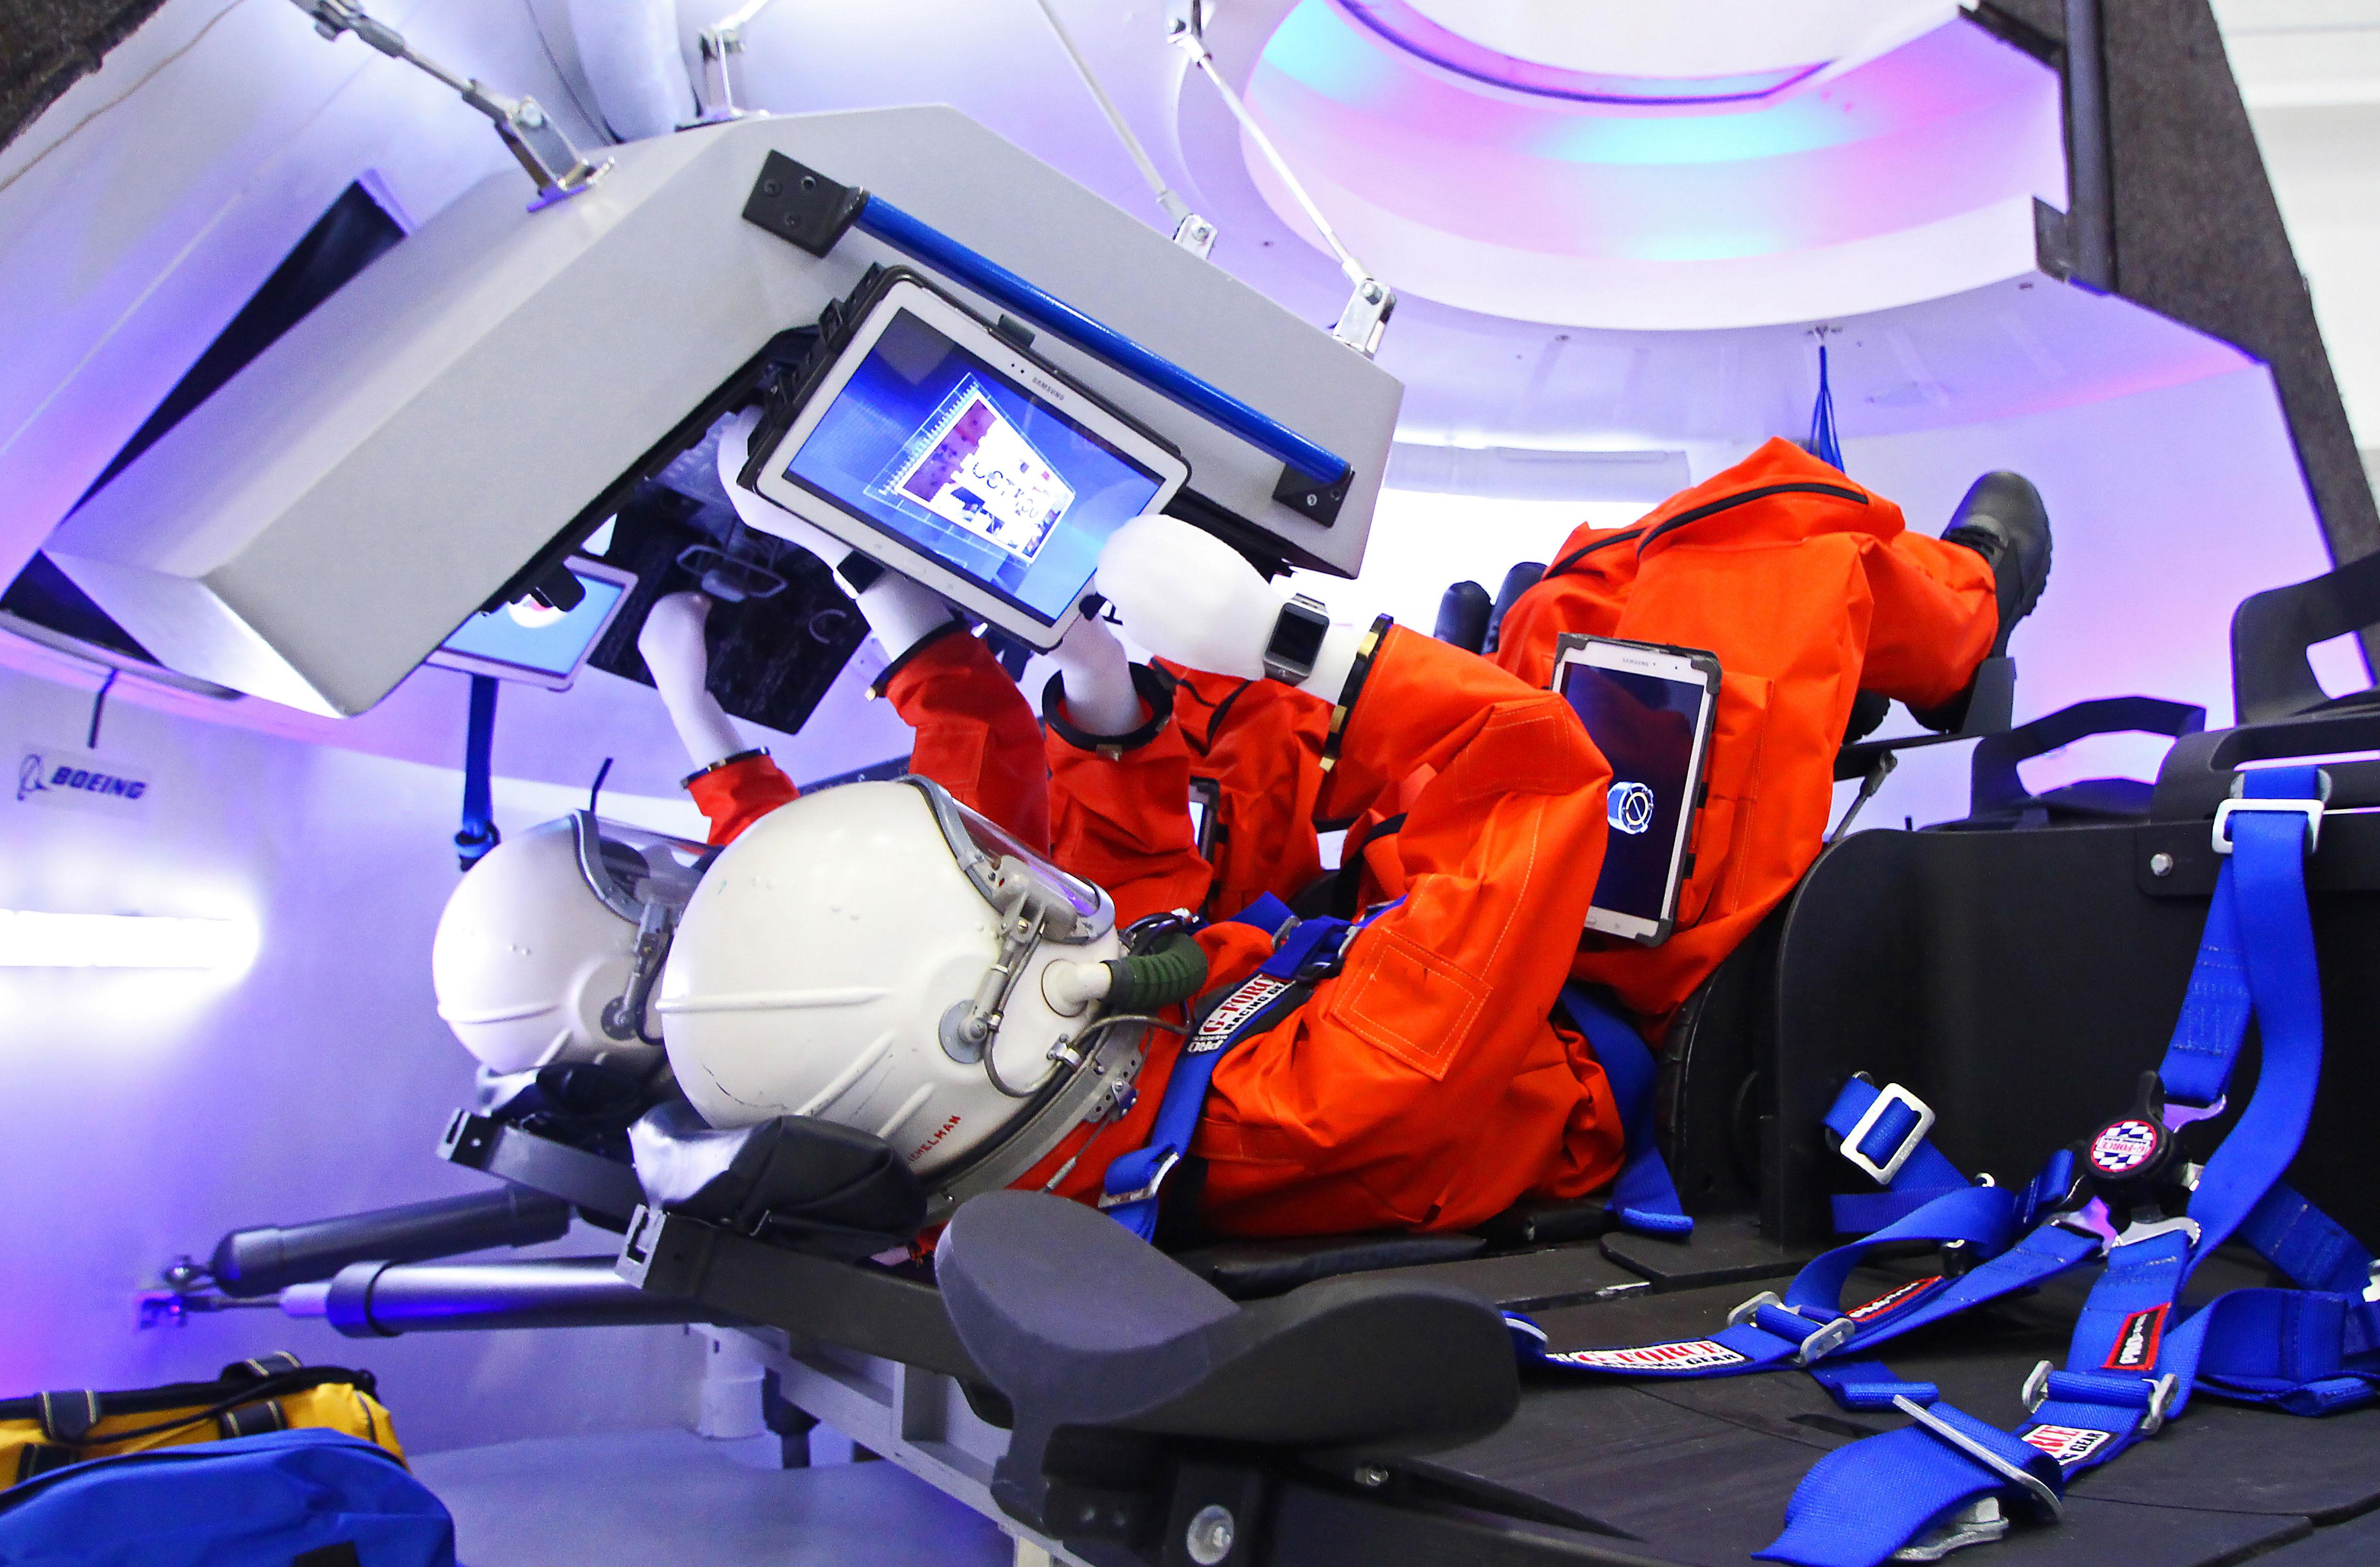 Taking a peek inside Boeing's new high-tech CST-100 mock up test article. Credit: Mike Killian